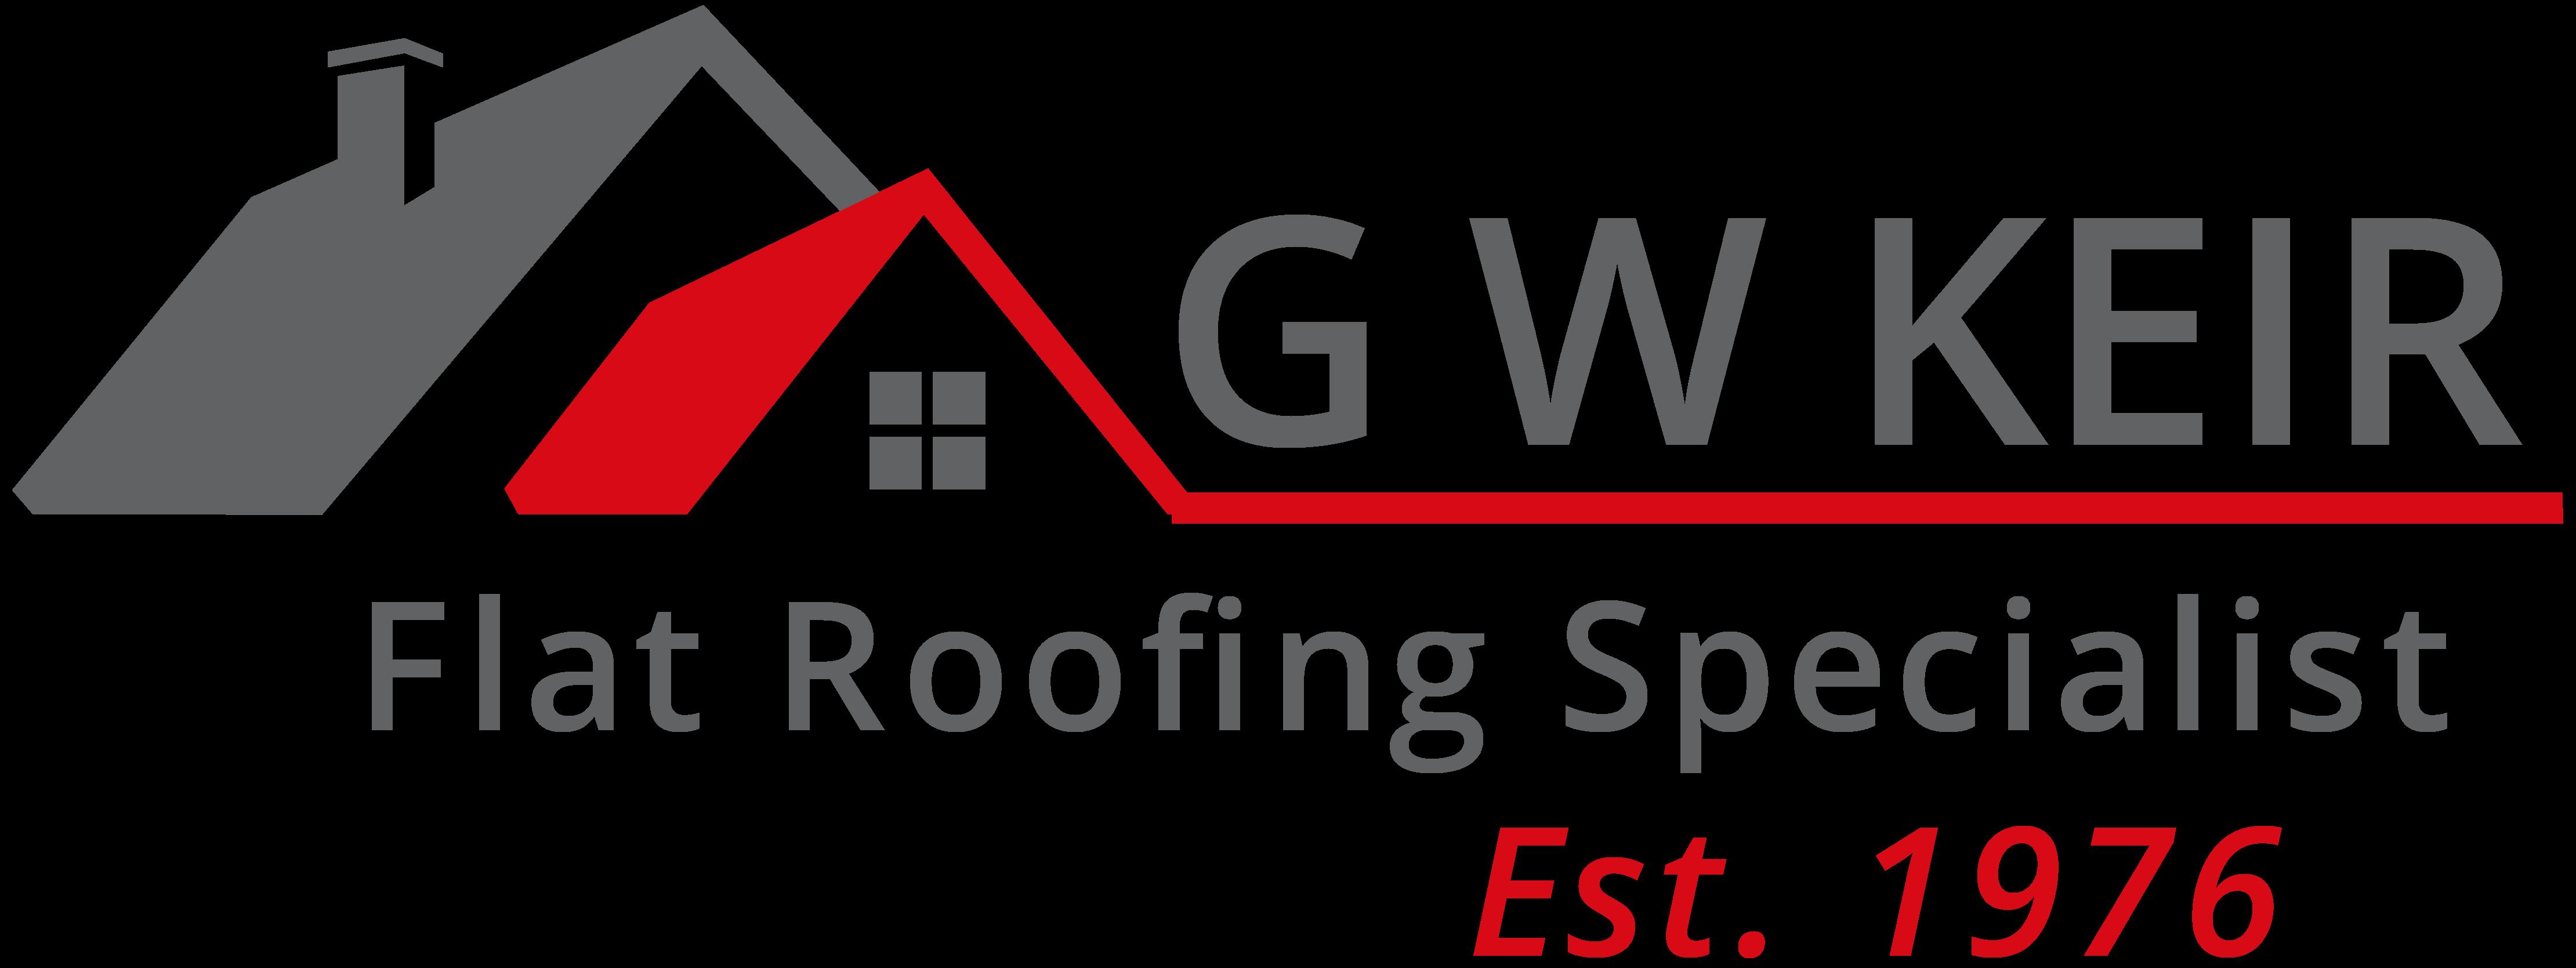 G W Keir Roofing – Roof Replacement, Repair & Maintenance